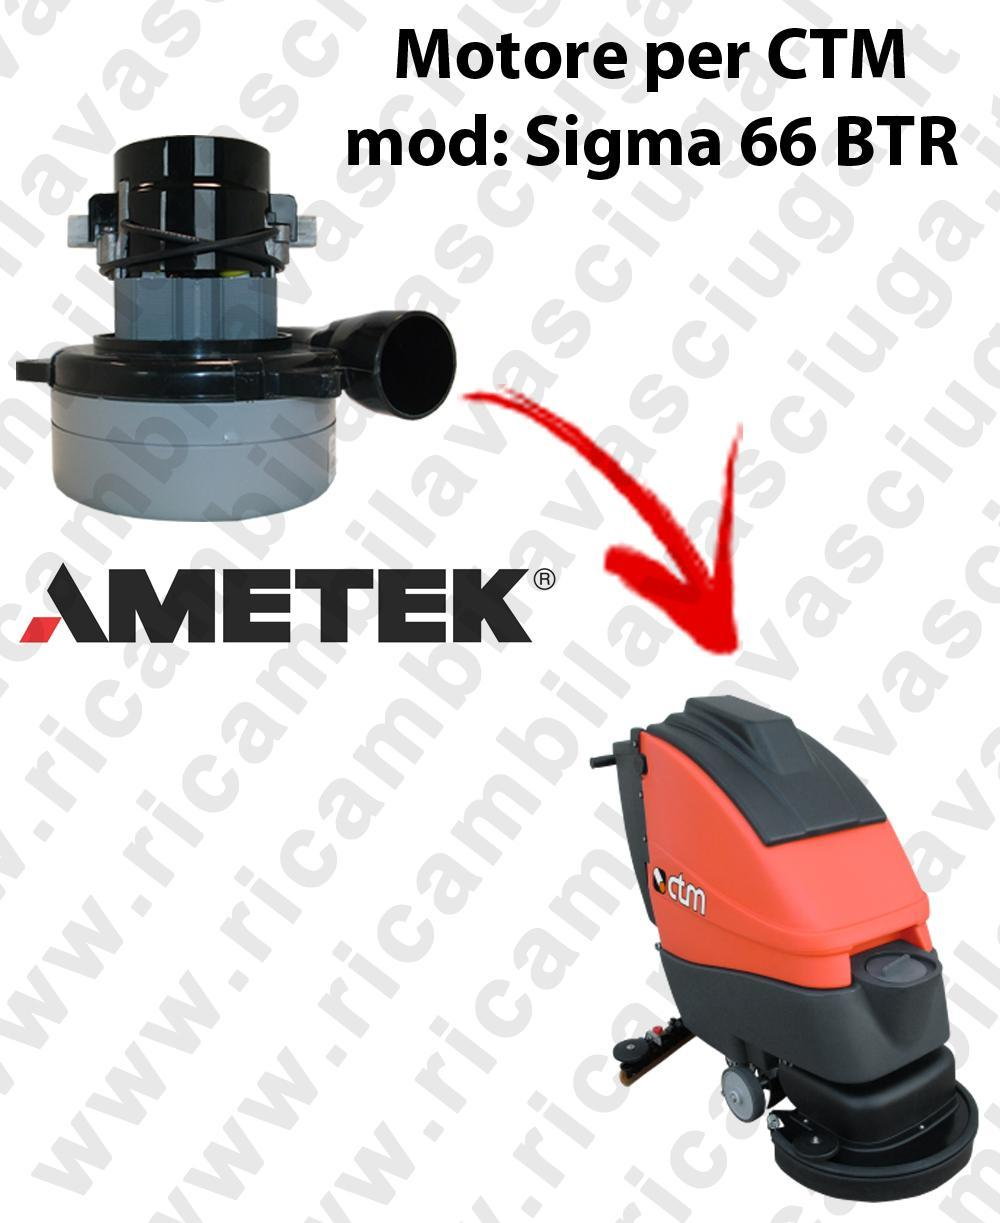 SIGMA 66 BTR Motore de aspiración LAMB AMETEK para fregadora CTM